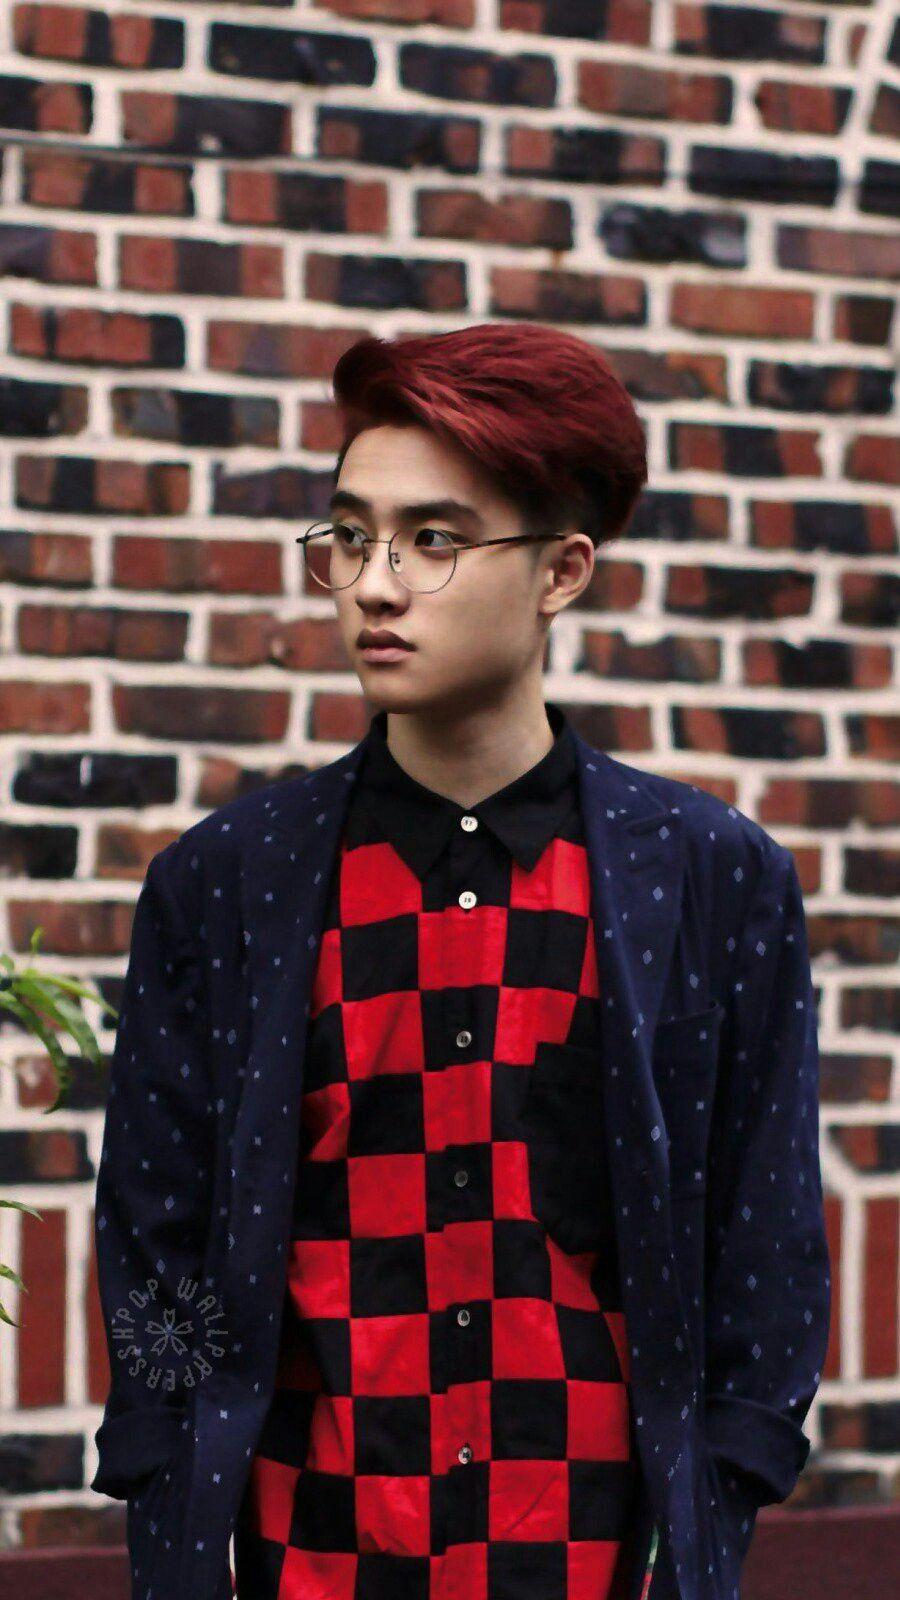 Chanyeol Exo Red Hair